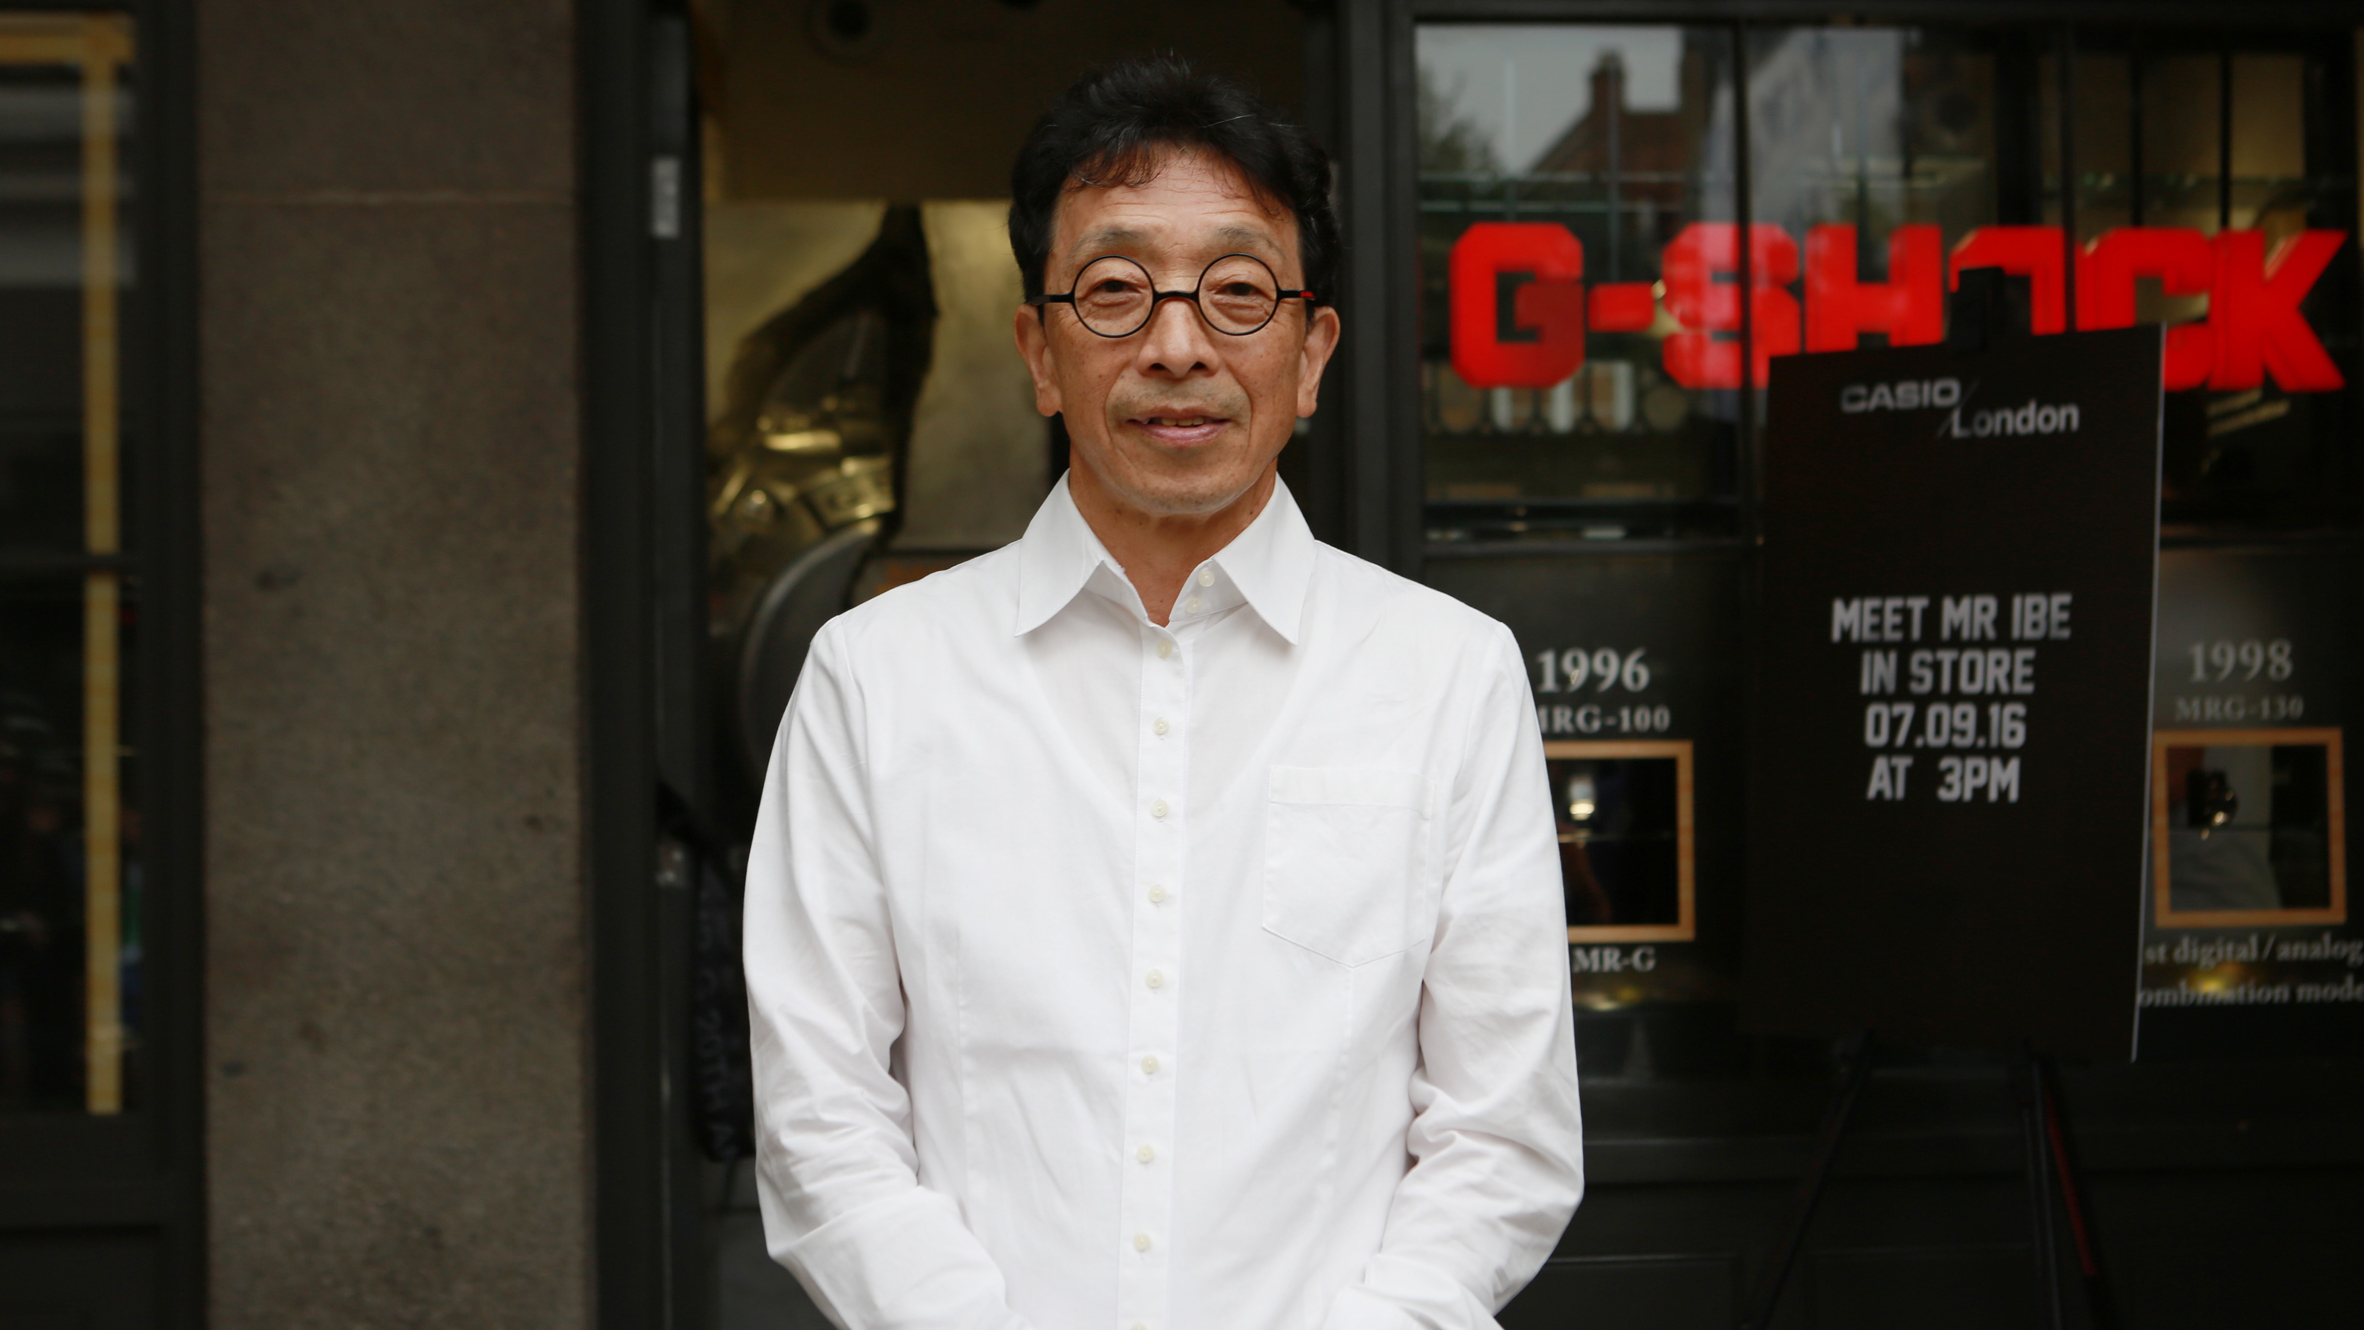 Casio's research and development chief engineer Kikuo Ibe